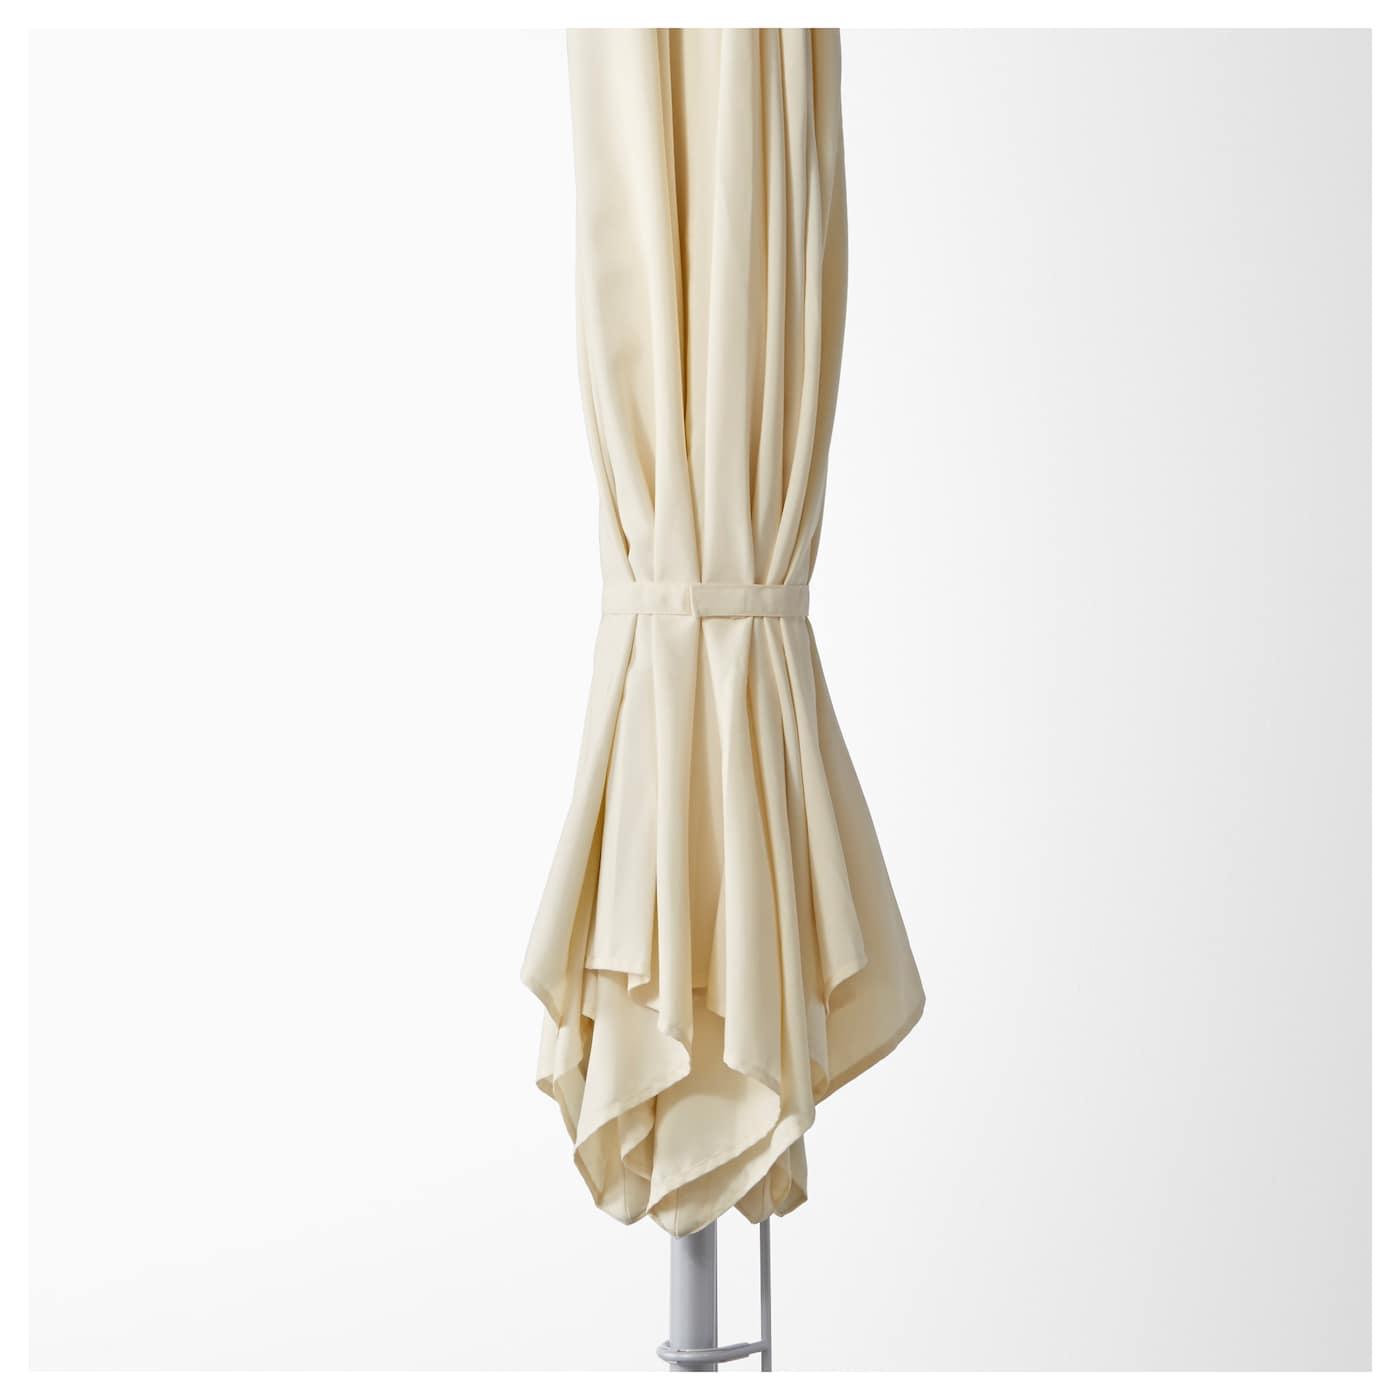 karls l k parasol avec pied inclinable beige gris ikea. Black Bedroom Furniture Sets. Home Design Ideas